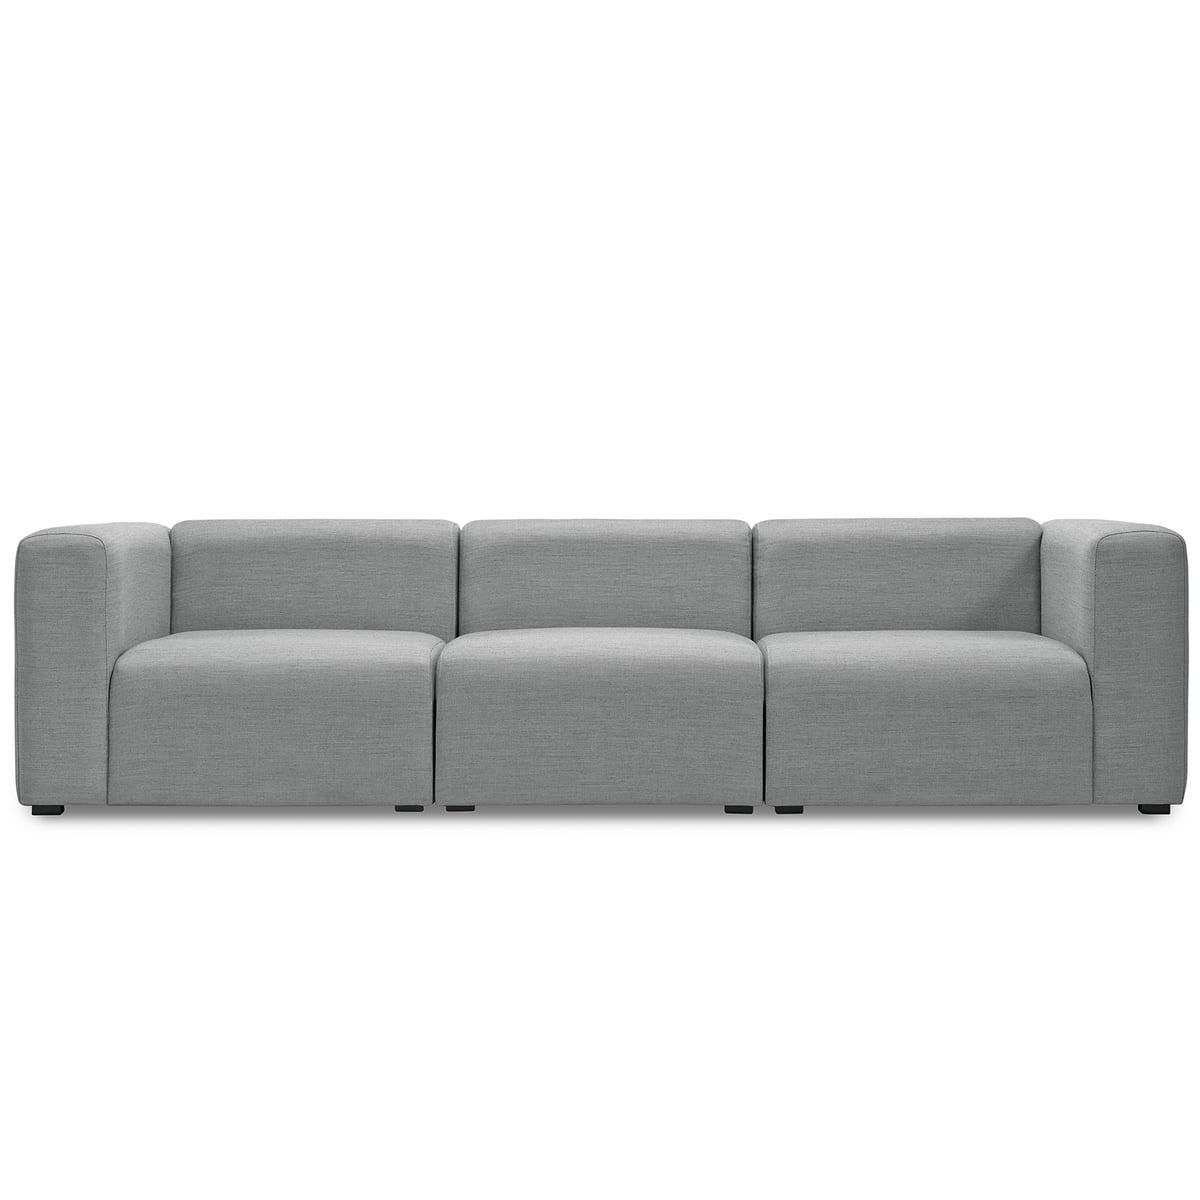 mags sofa 3 seater hay shop. Black Bedroom Furniture Sets. Home Design Ideas